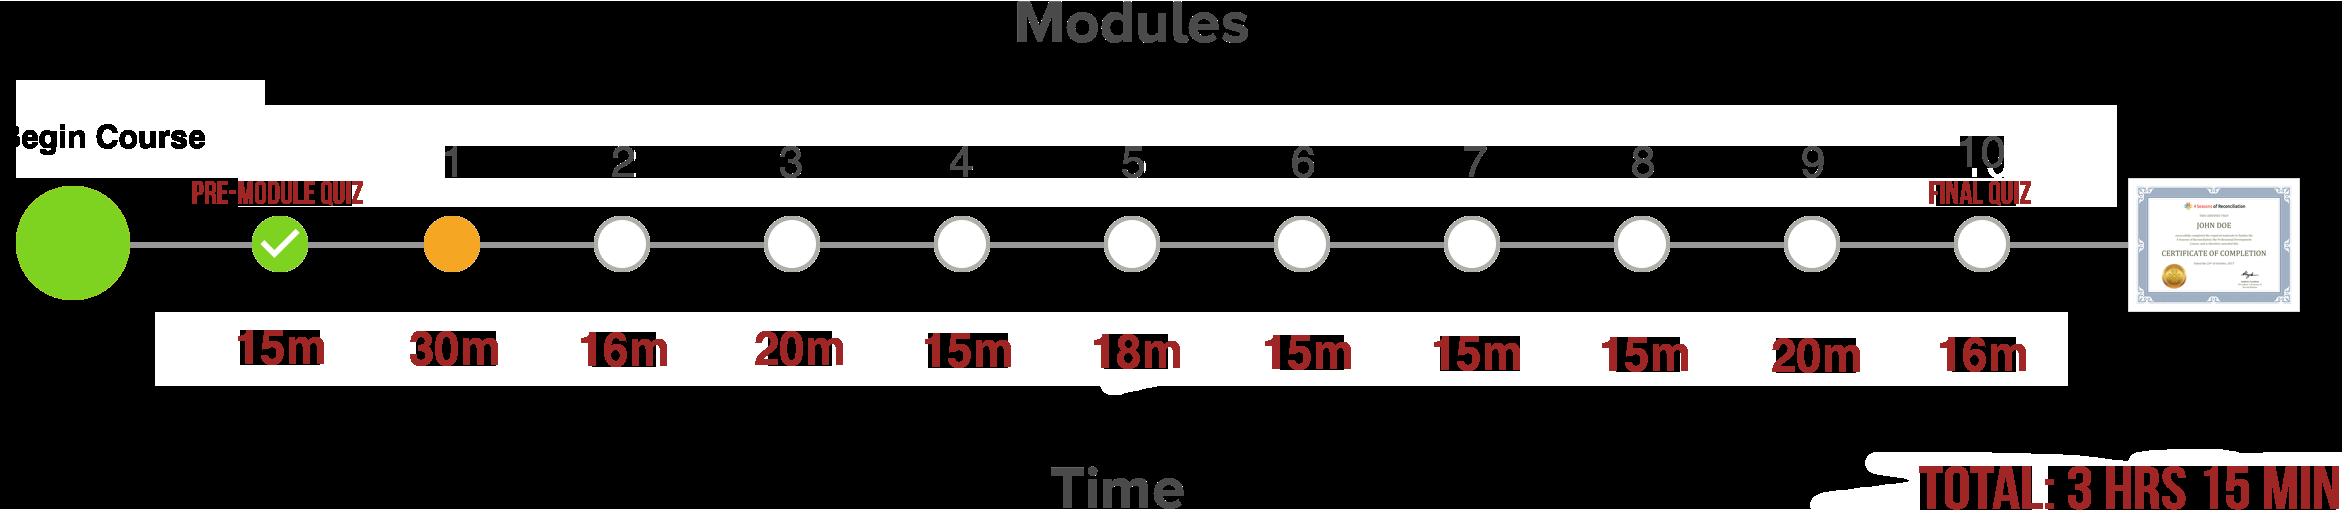 Module1_Orange.png